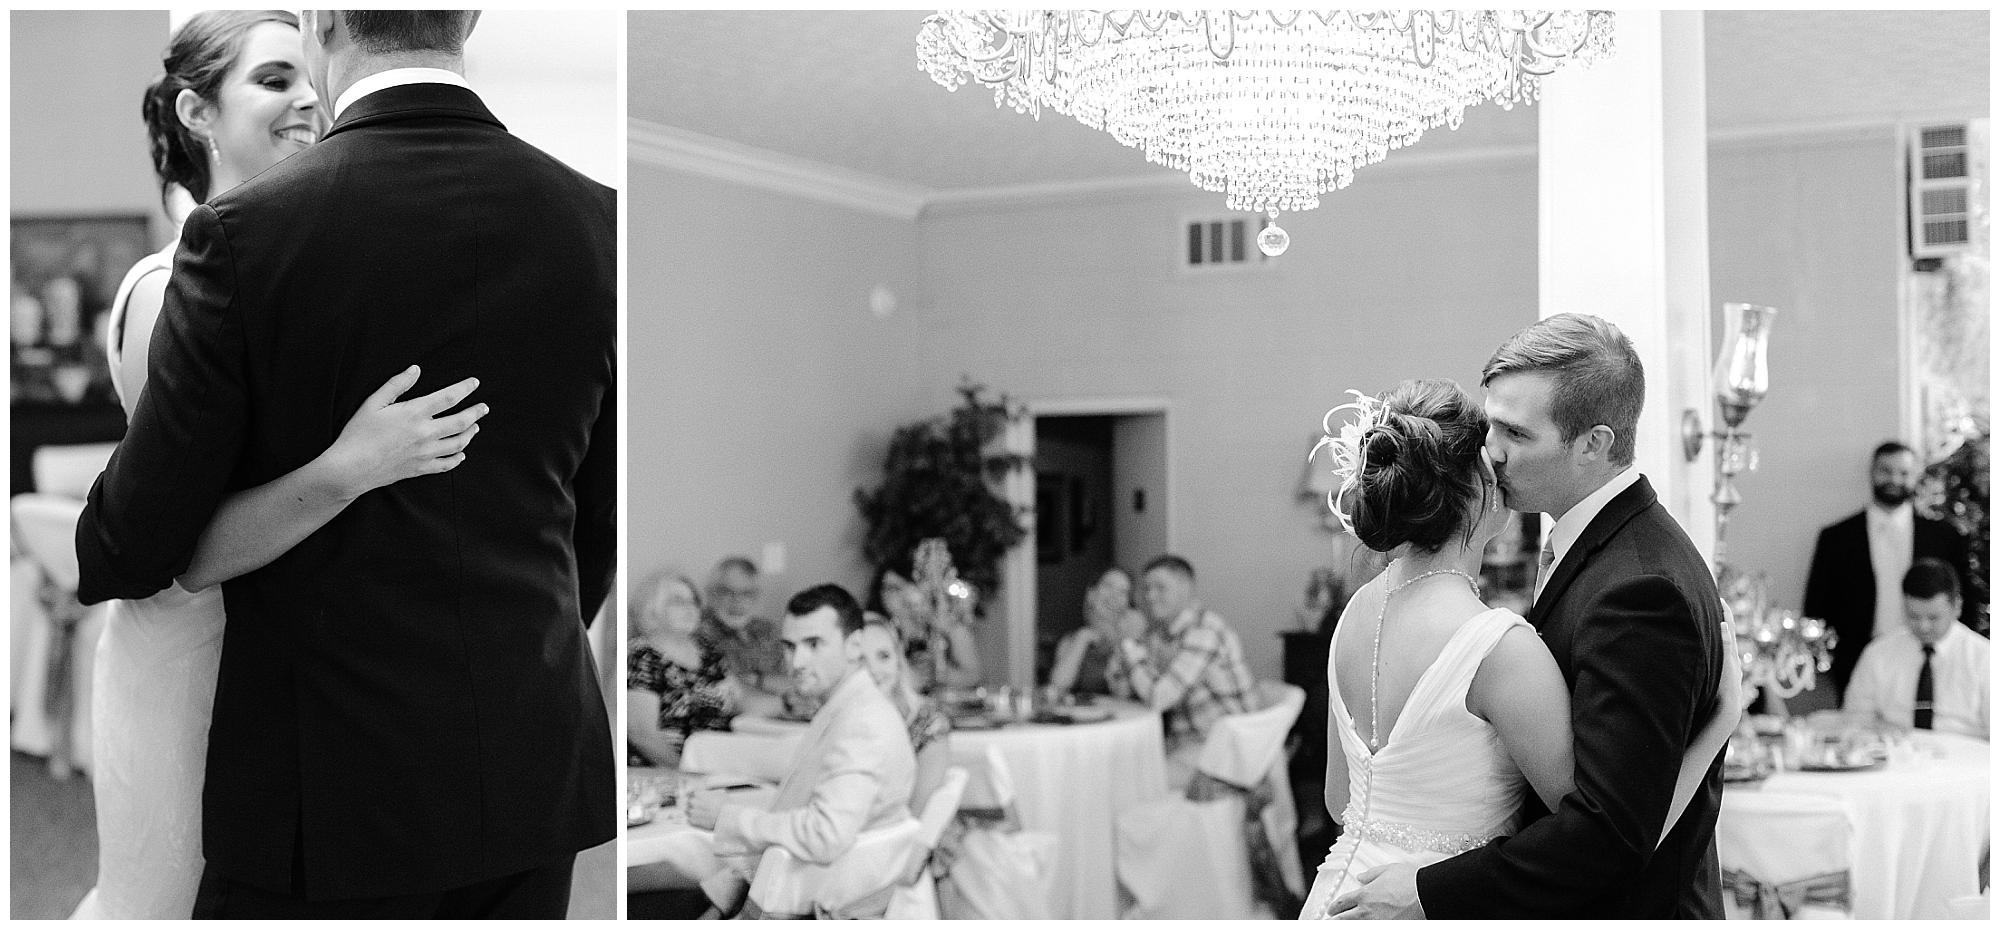 somerset, ky wedding photographers